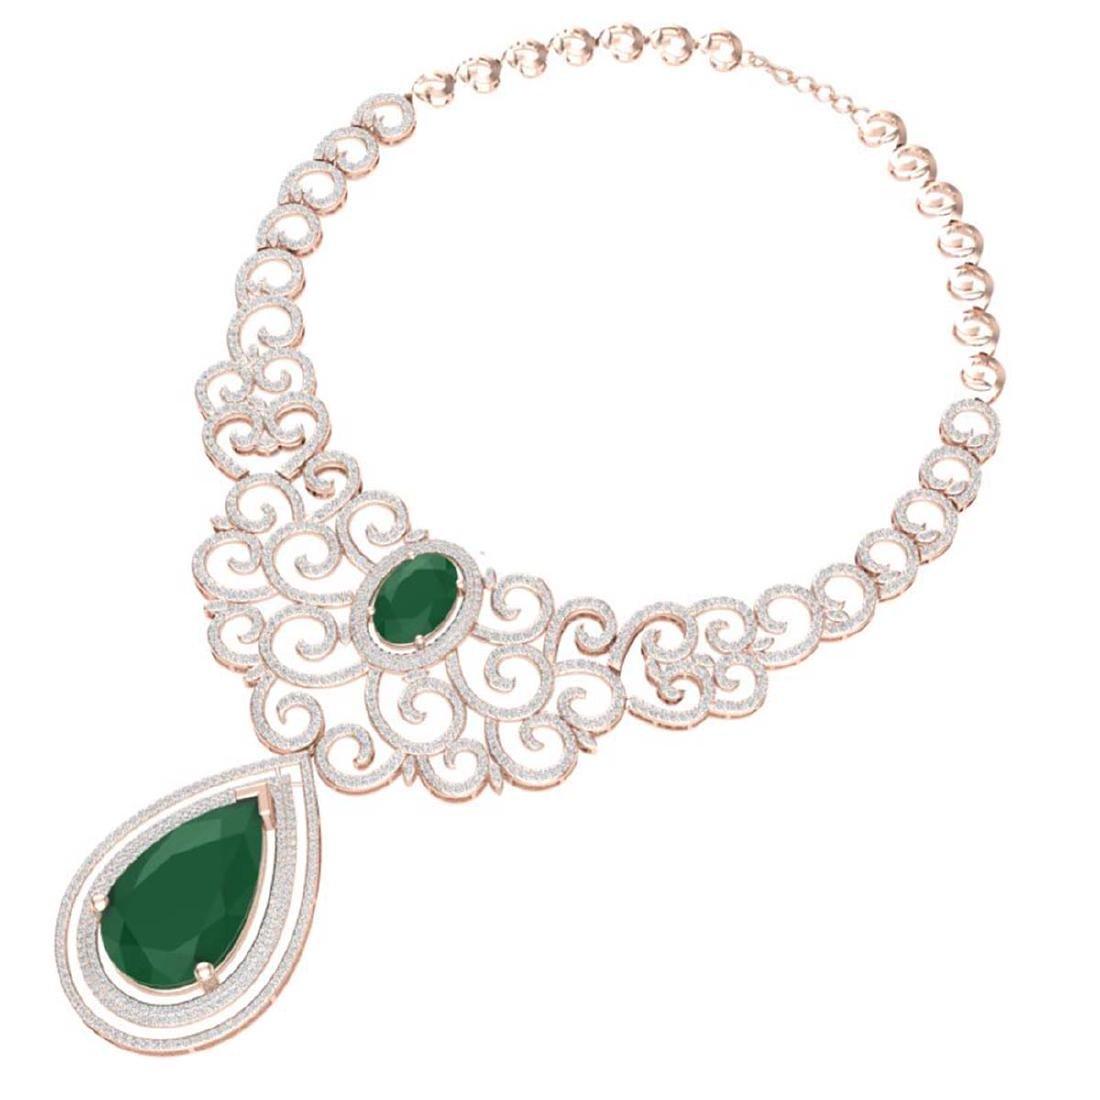 87.52 CTW Royalty Emerald & VS Diamond Necklace 18K - 3